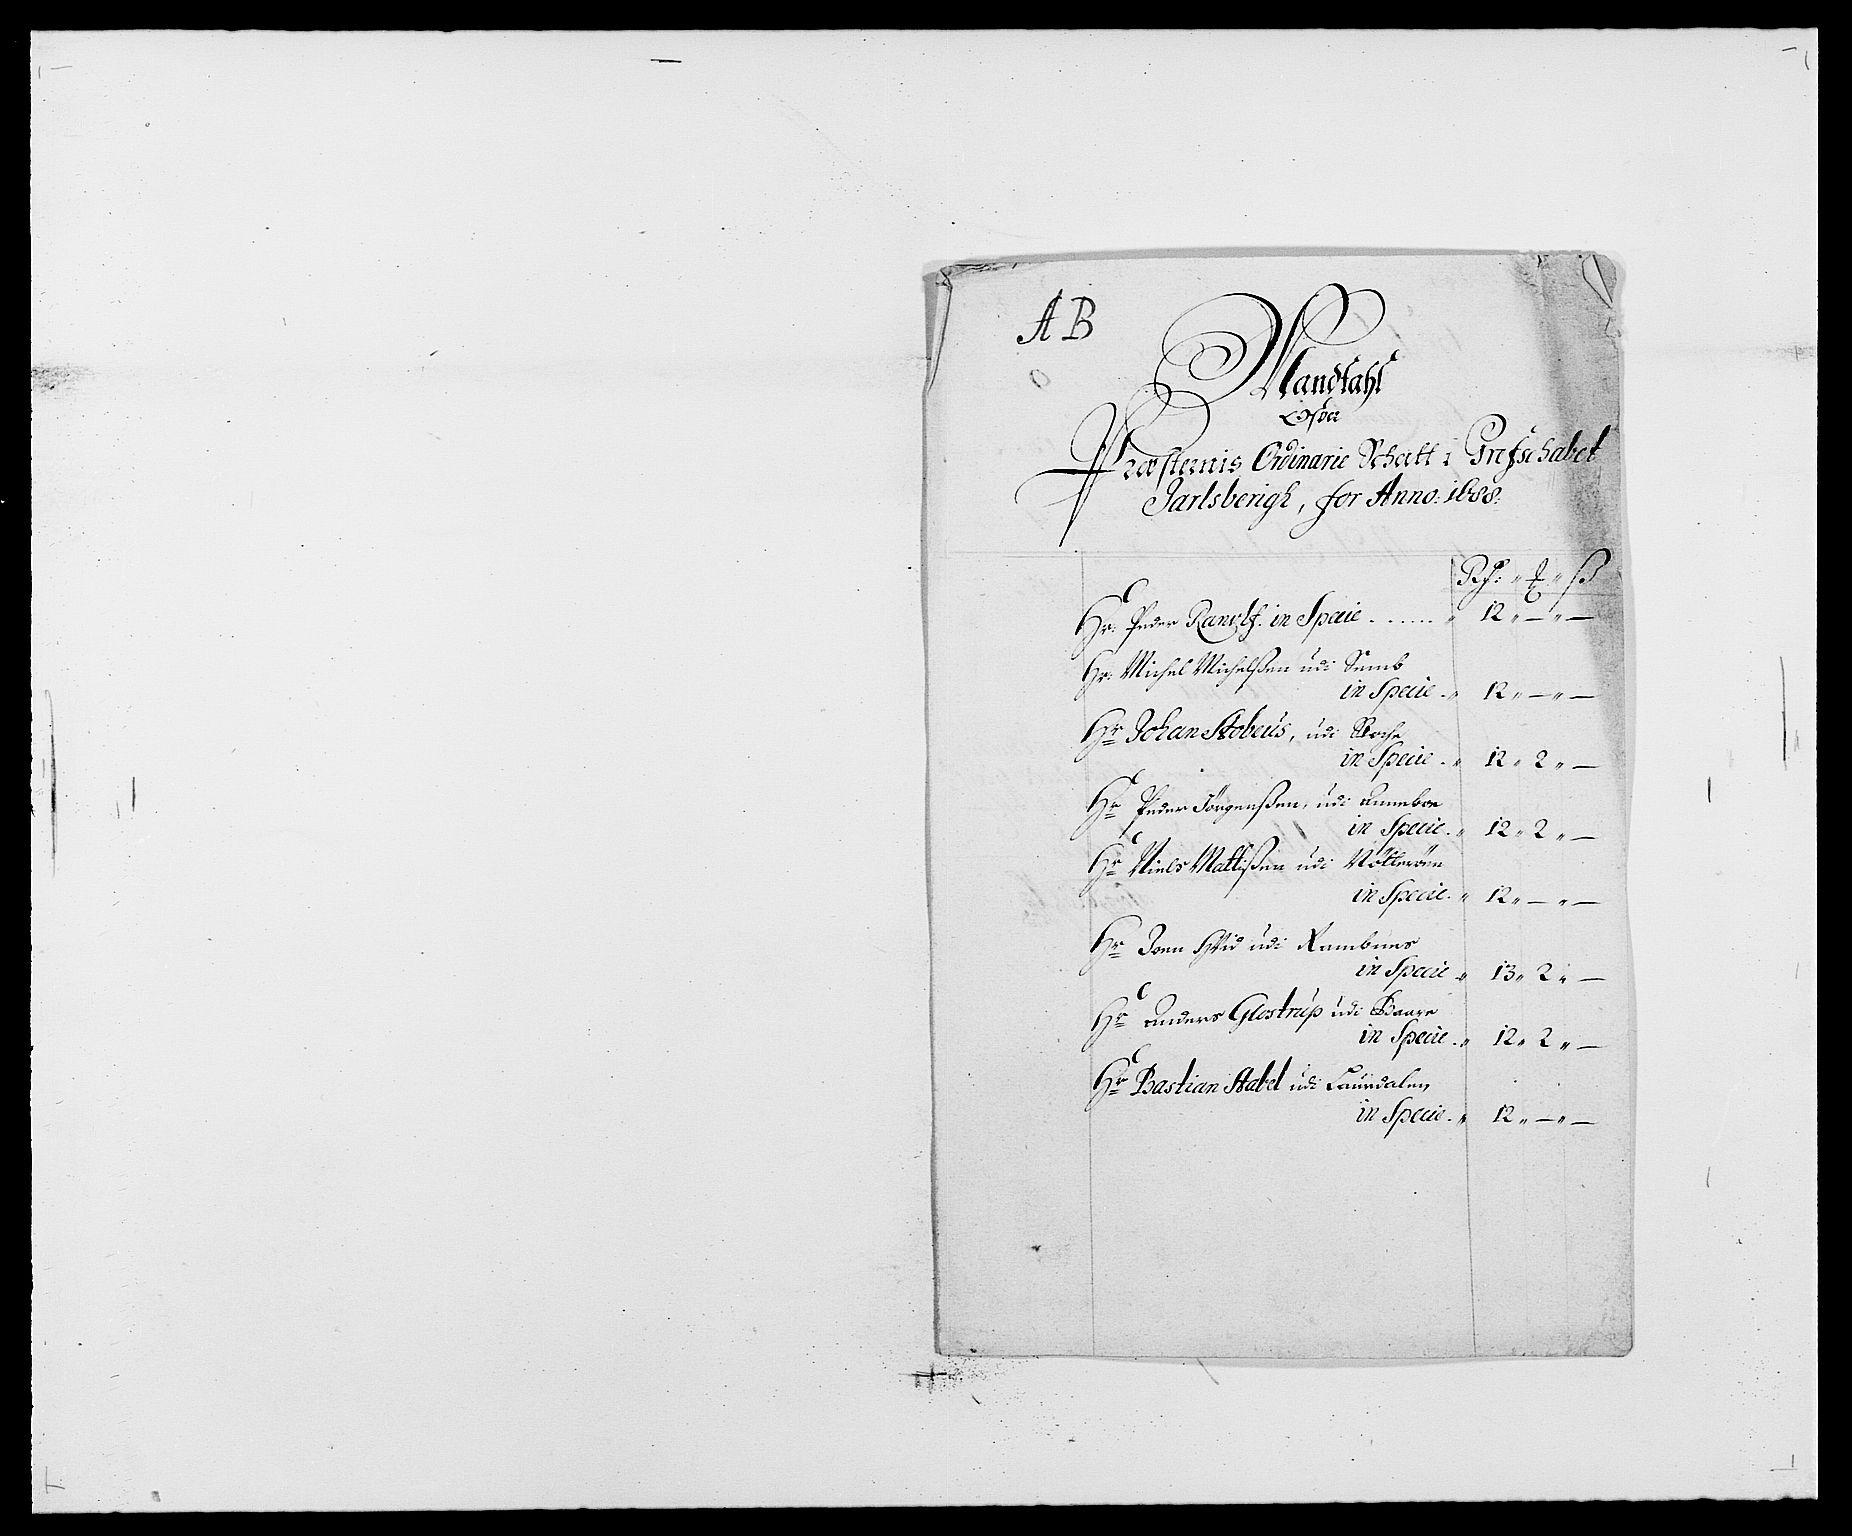 RA, Rentekammeret inntil 1814, Reviderte regnskaper, Fogderegnskap, R32/L1859: Fogderegnskap Jarlsberg grevskap, 1686-1690, s. 225